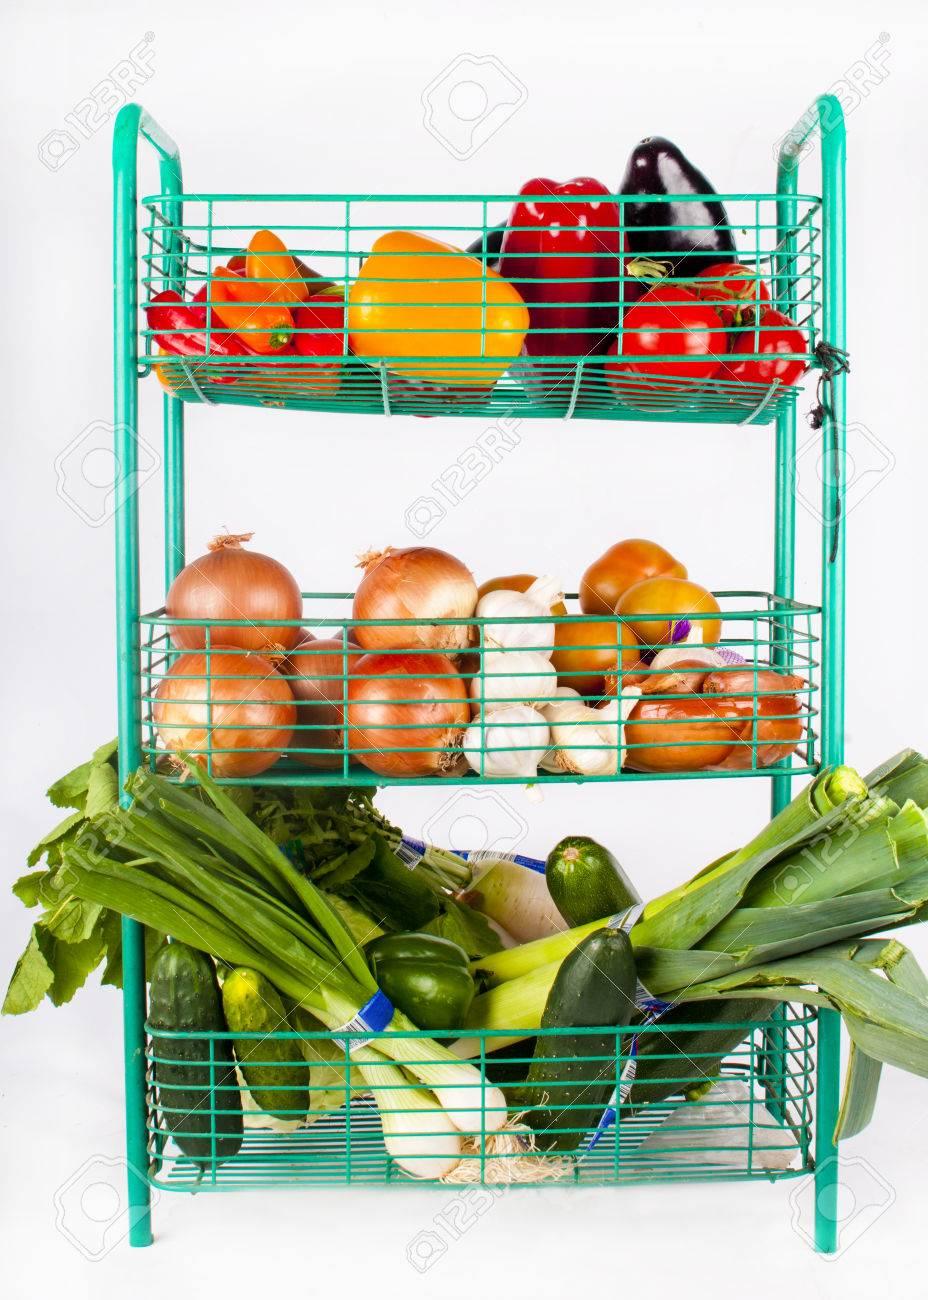 produce vegetable shelves display and bin detail tier fruit rack product